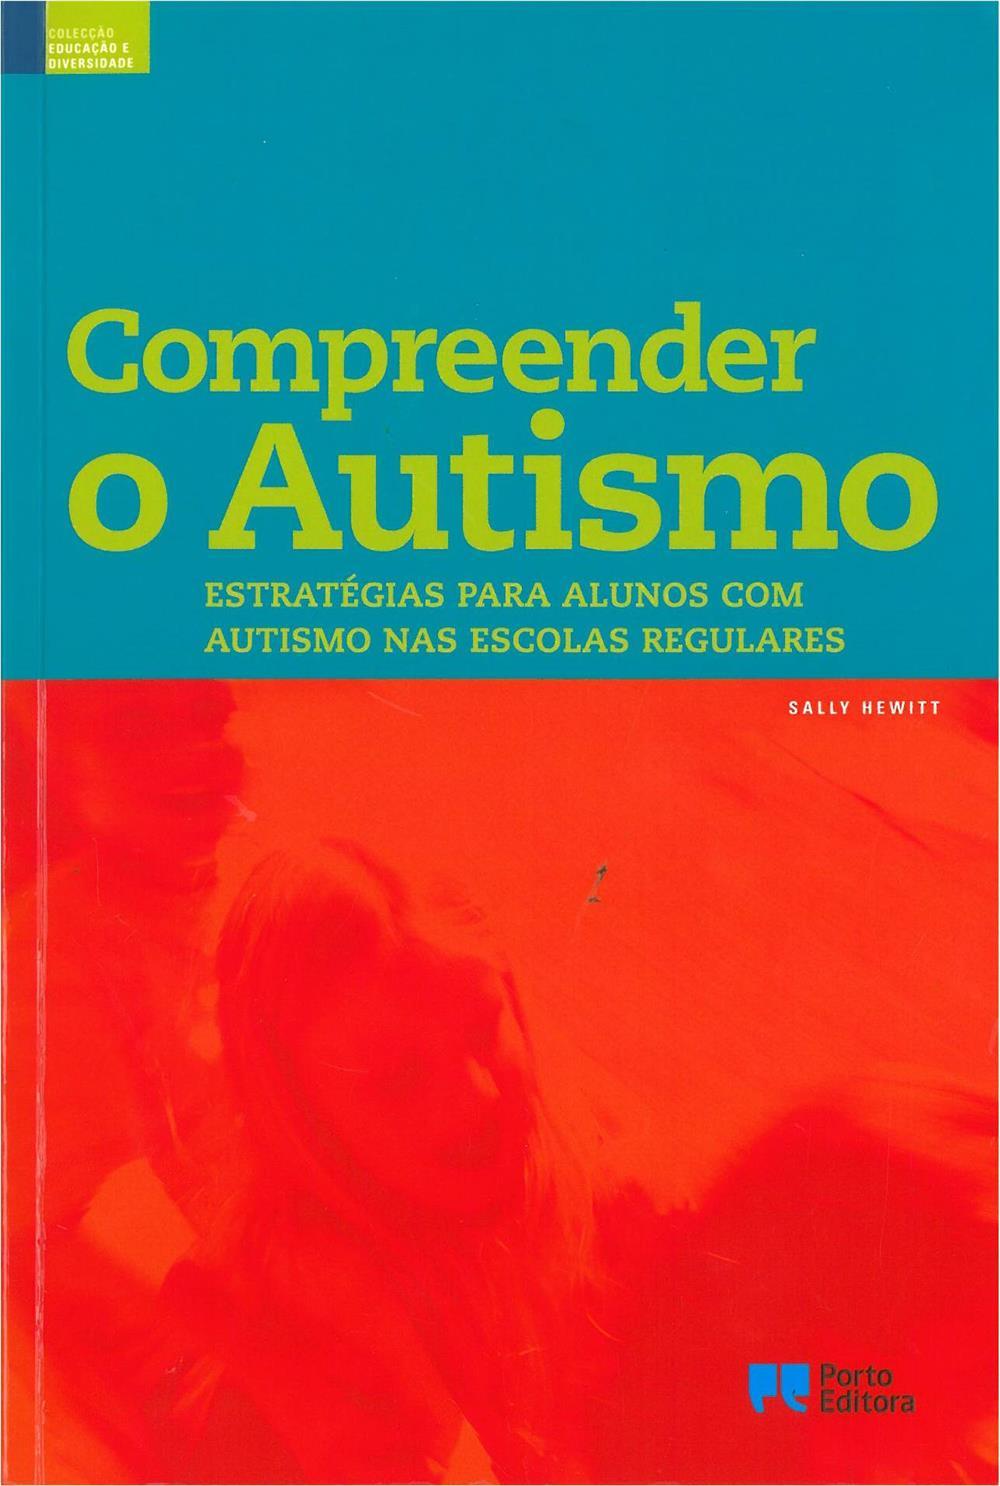 Compreender o autismo_.jpg